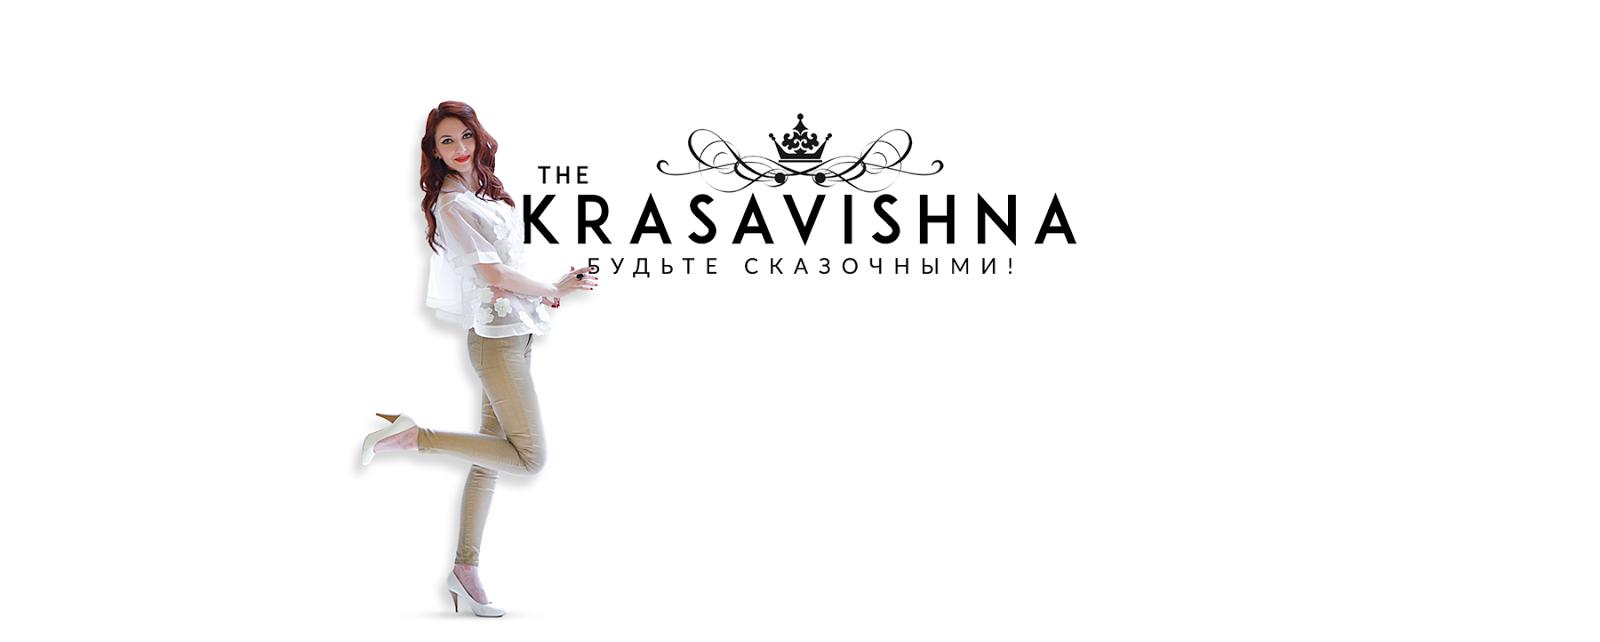 TheKrasavishna